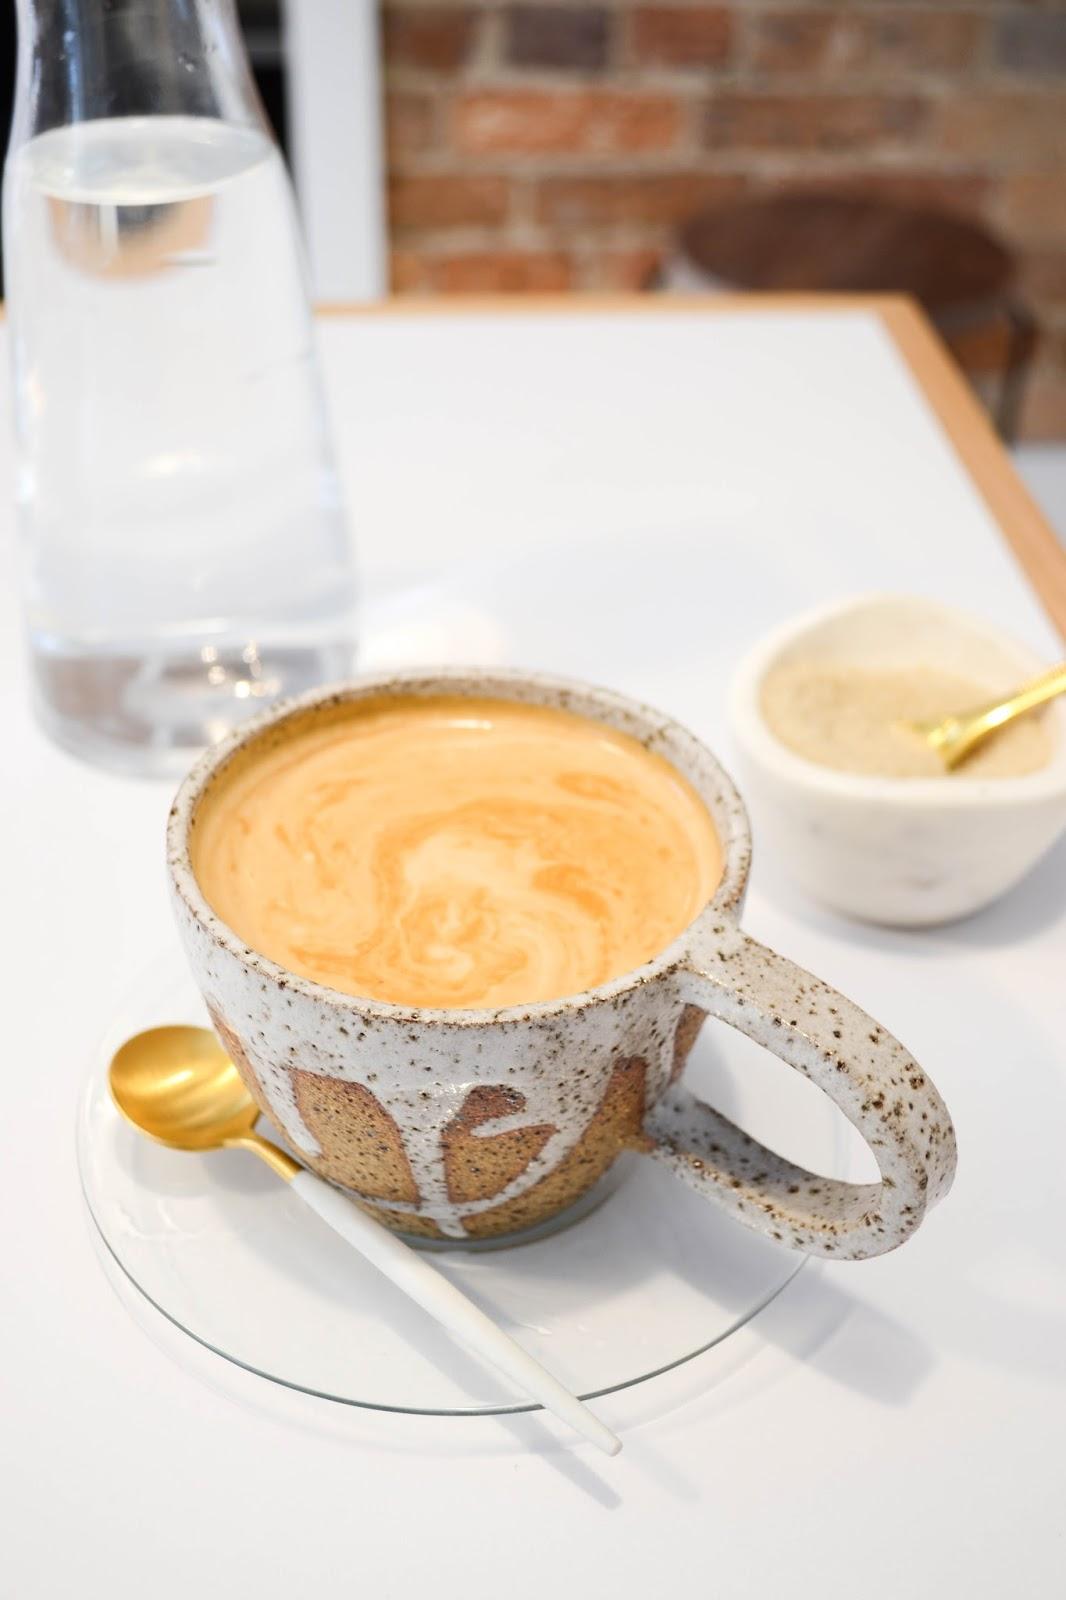 Glider Ks Cafe Menu